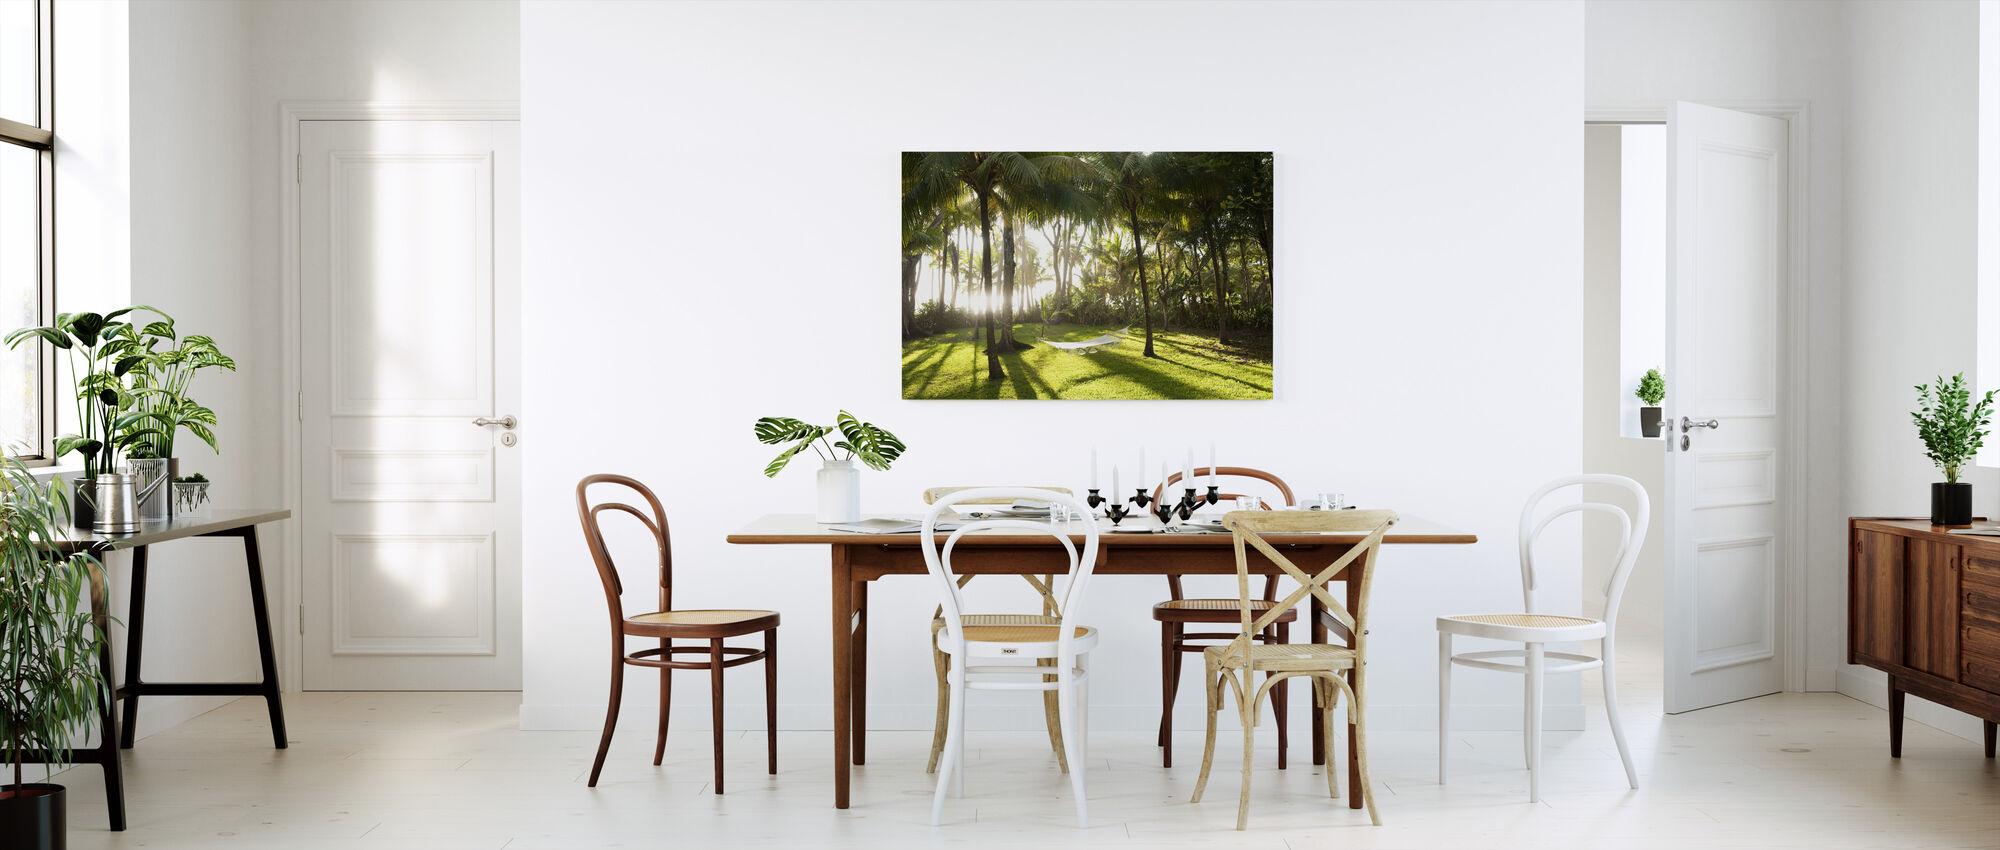 Hammock in Santa Teresa, Costa Rica - Canvas print - Kitchen